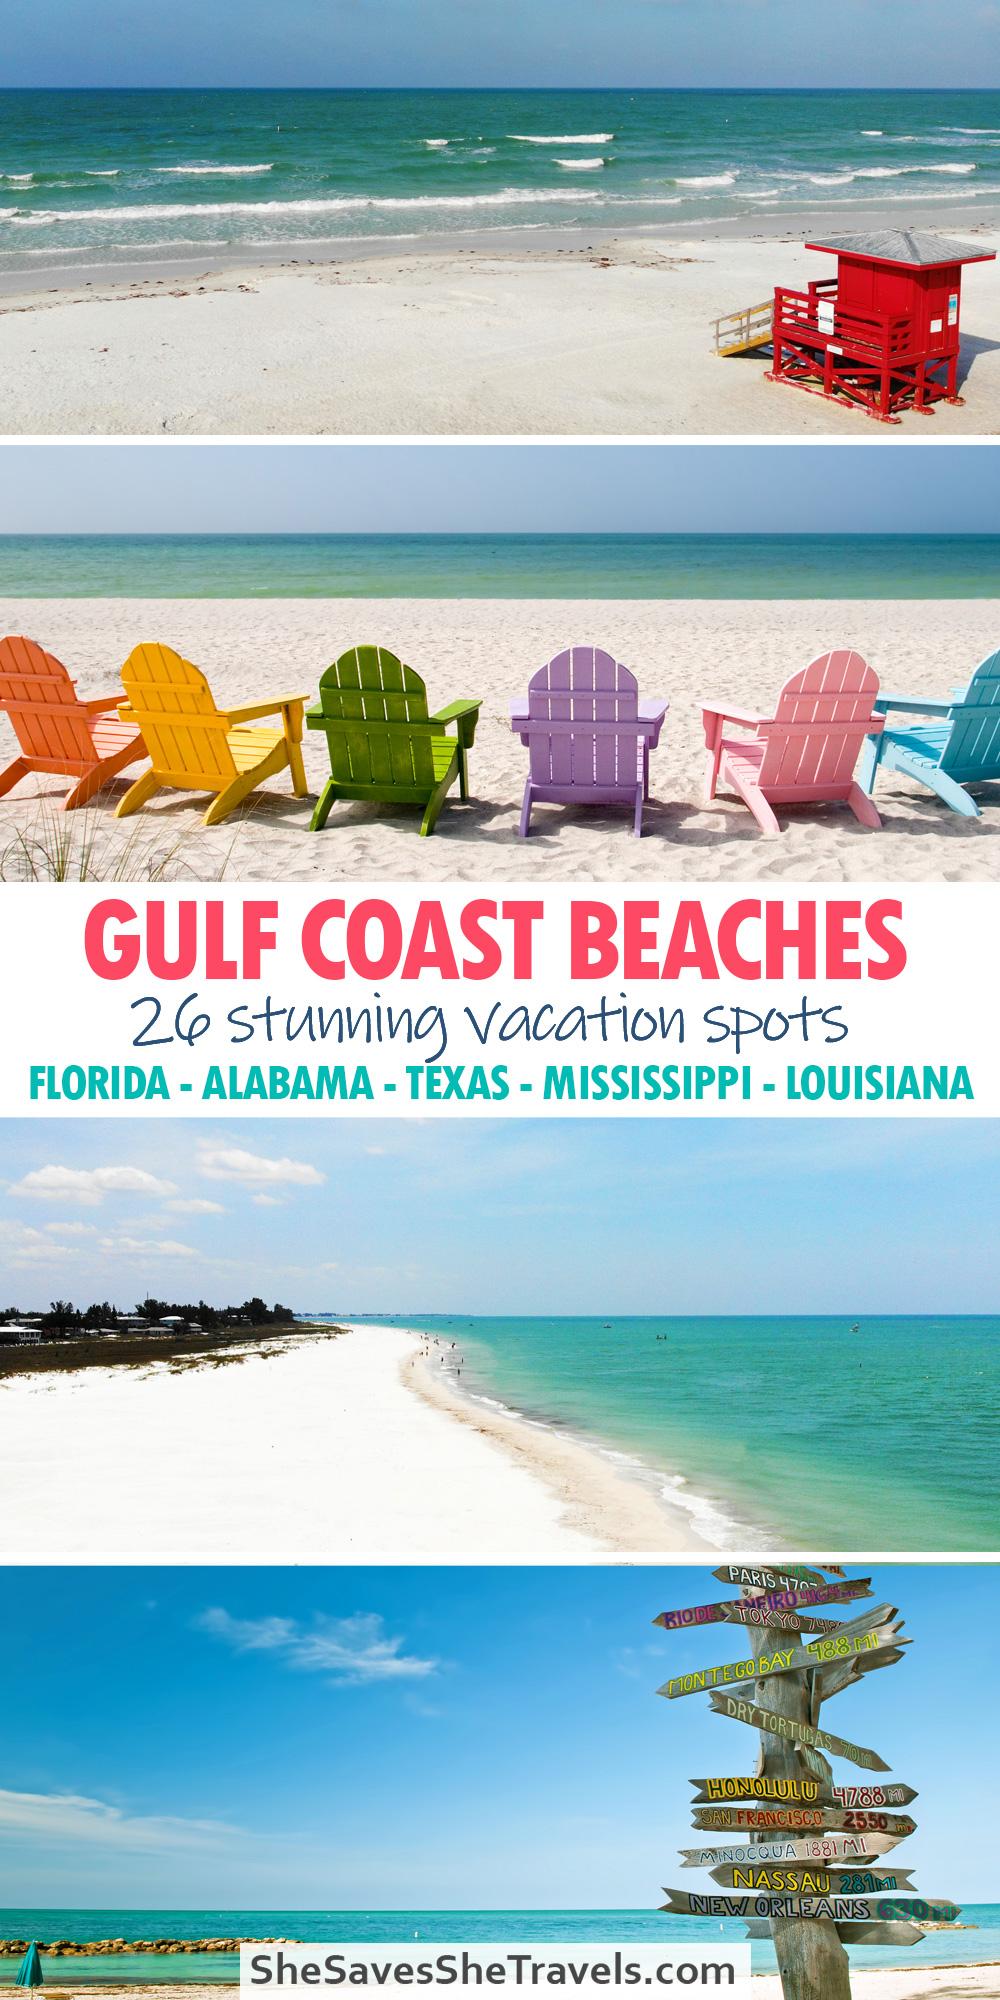 gulf coast beaches 26 stunning vacation spots Pinterest pin